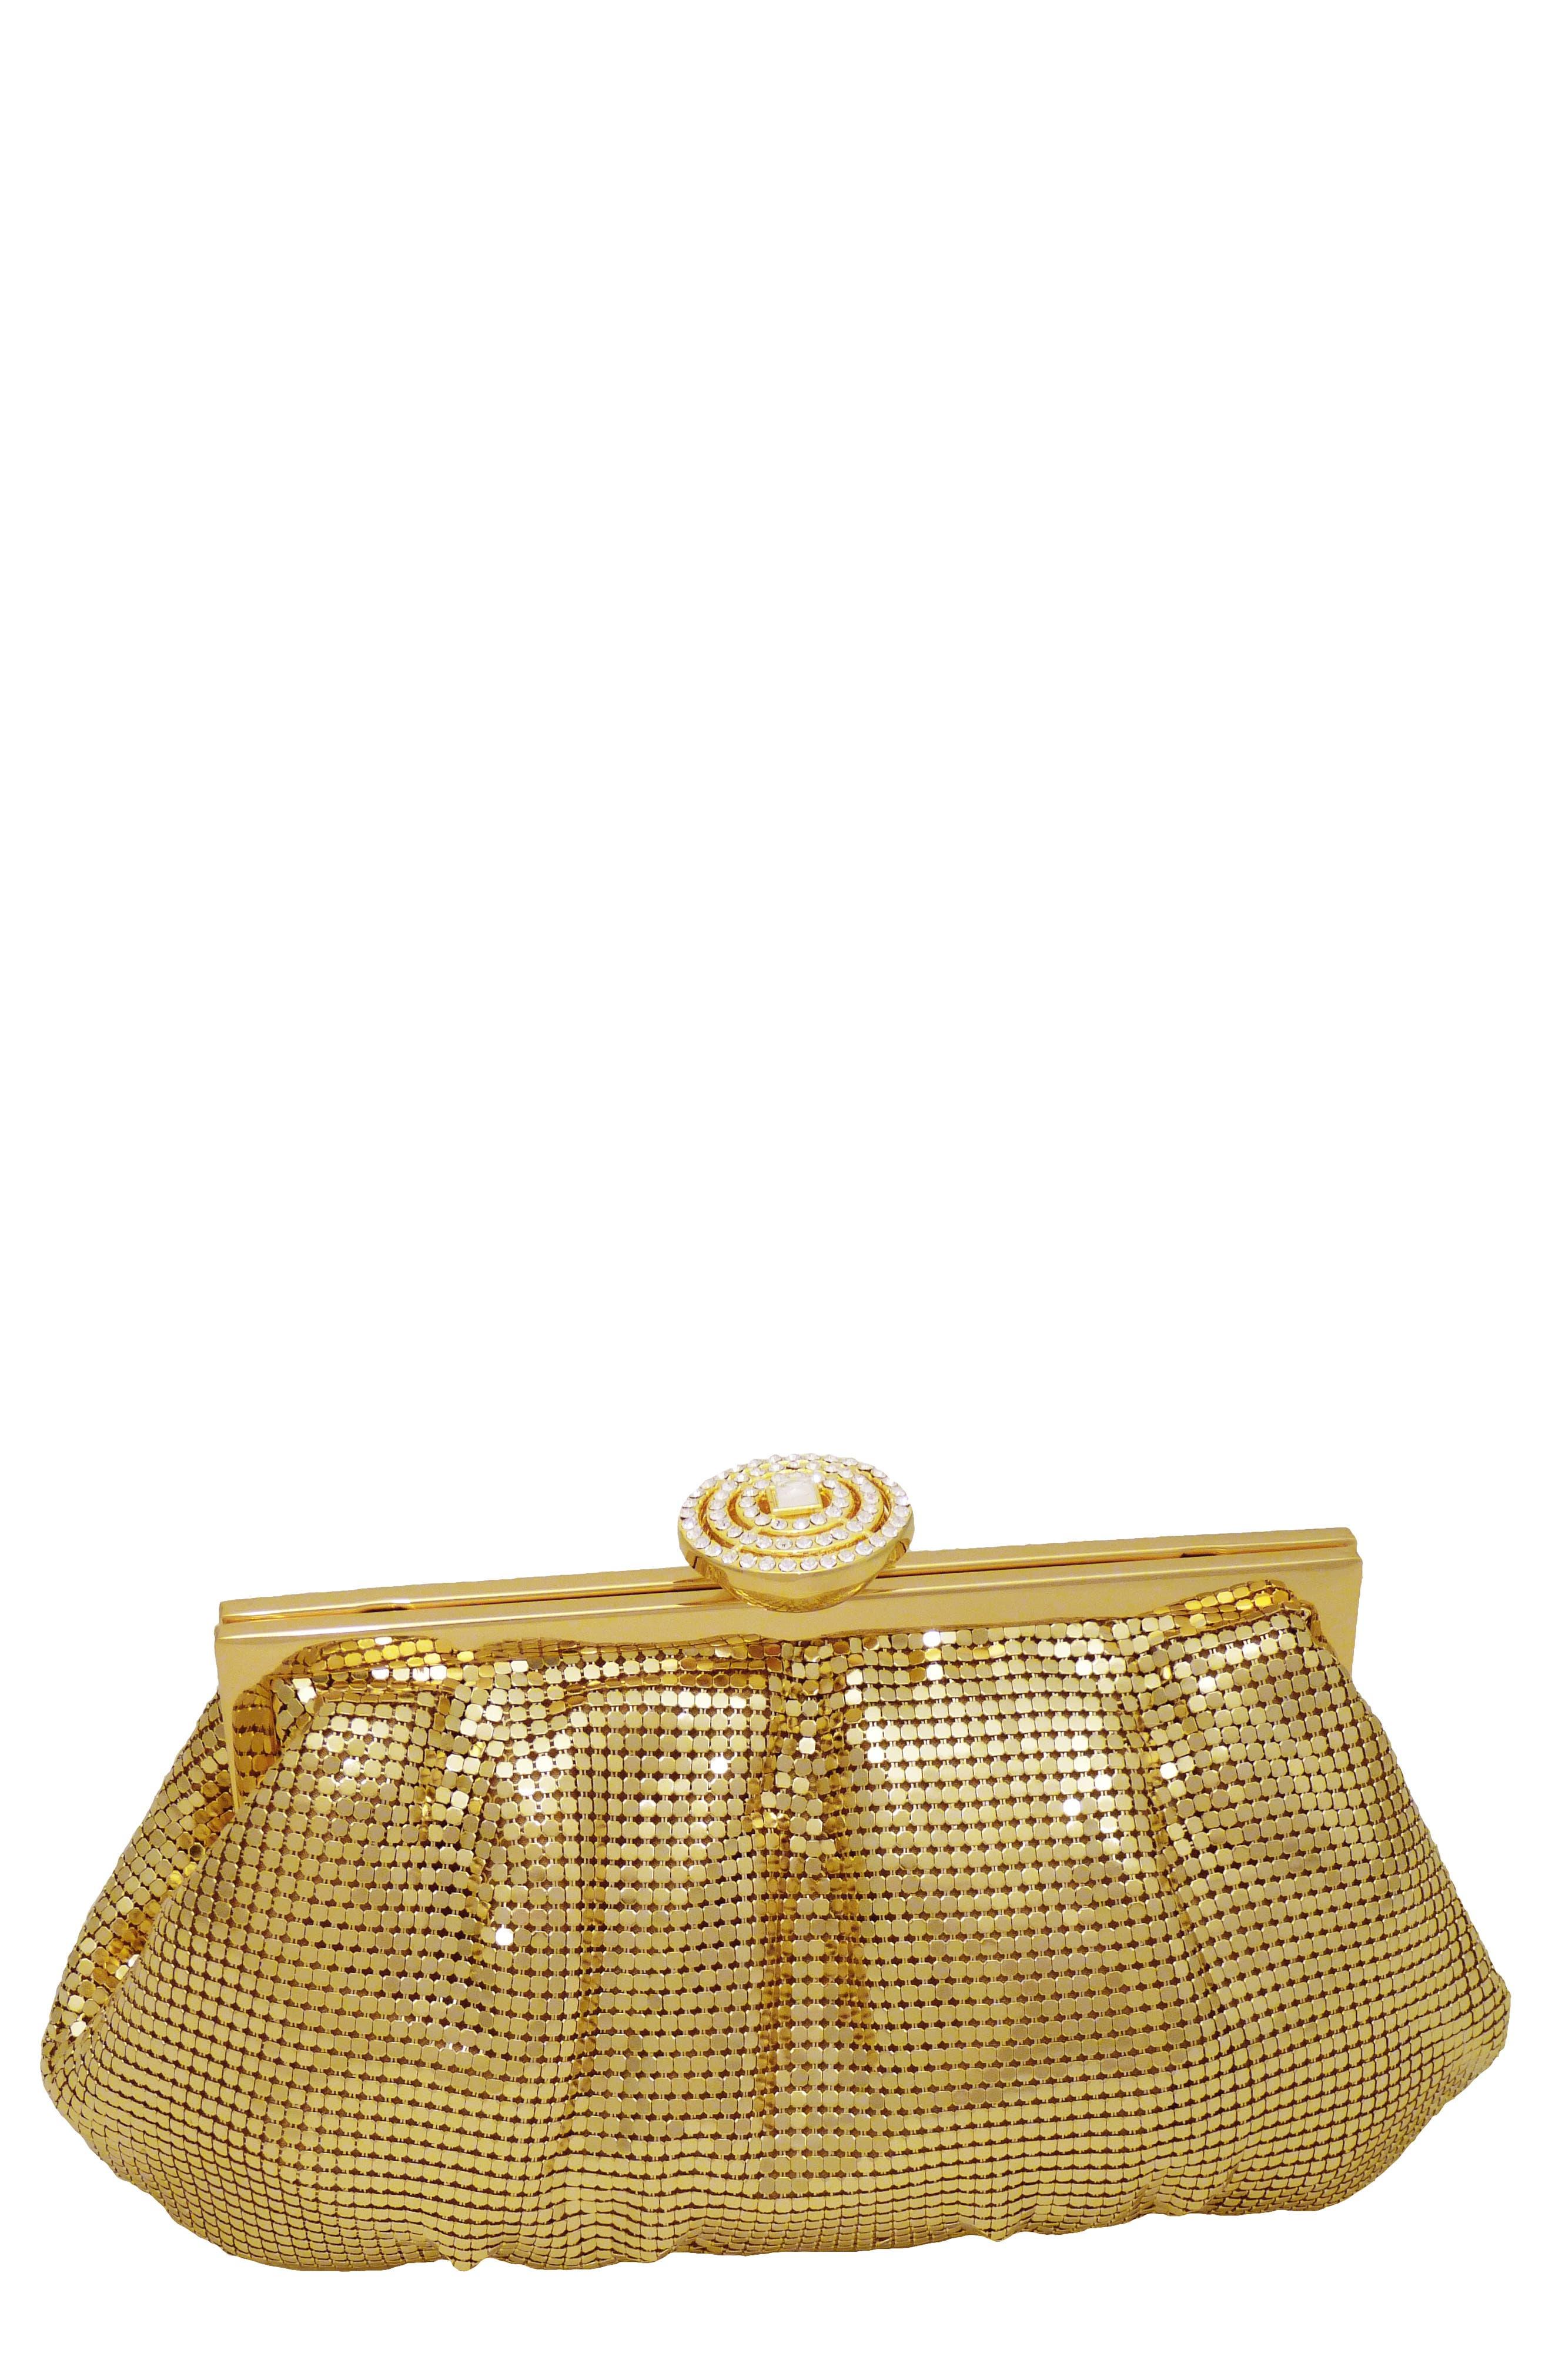 Marilyn Frame Clutch - Metallic in Gold